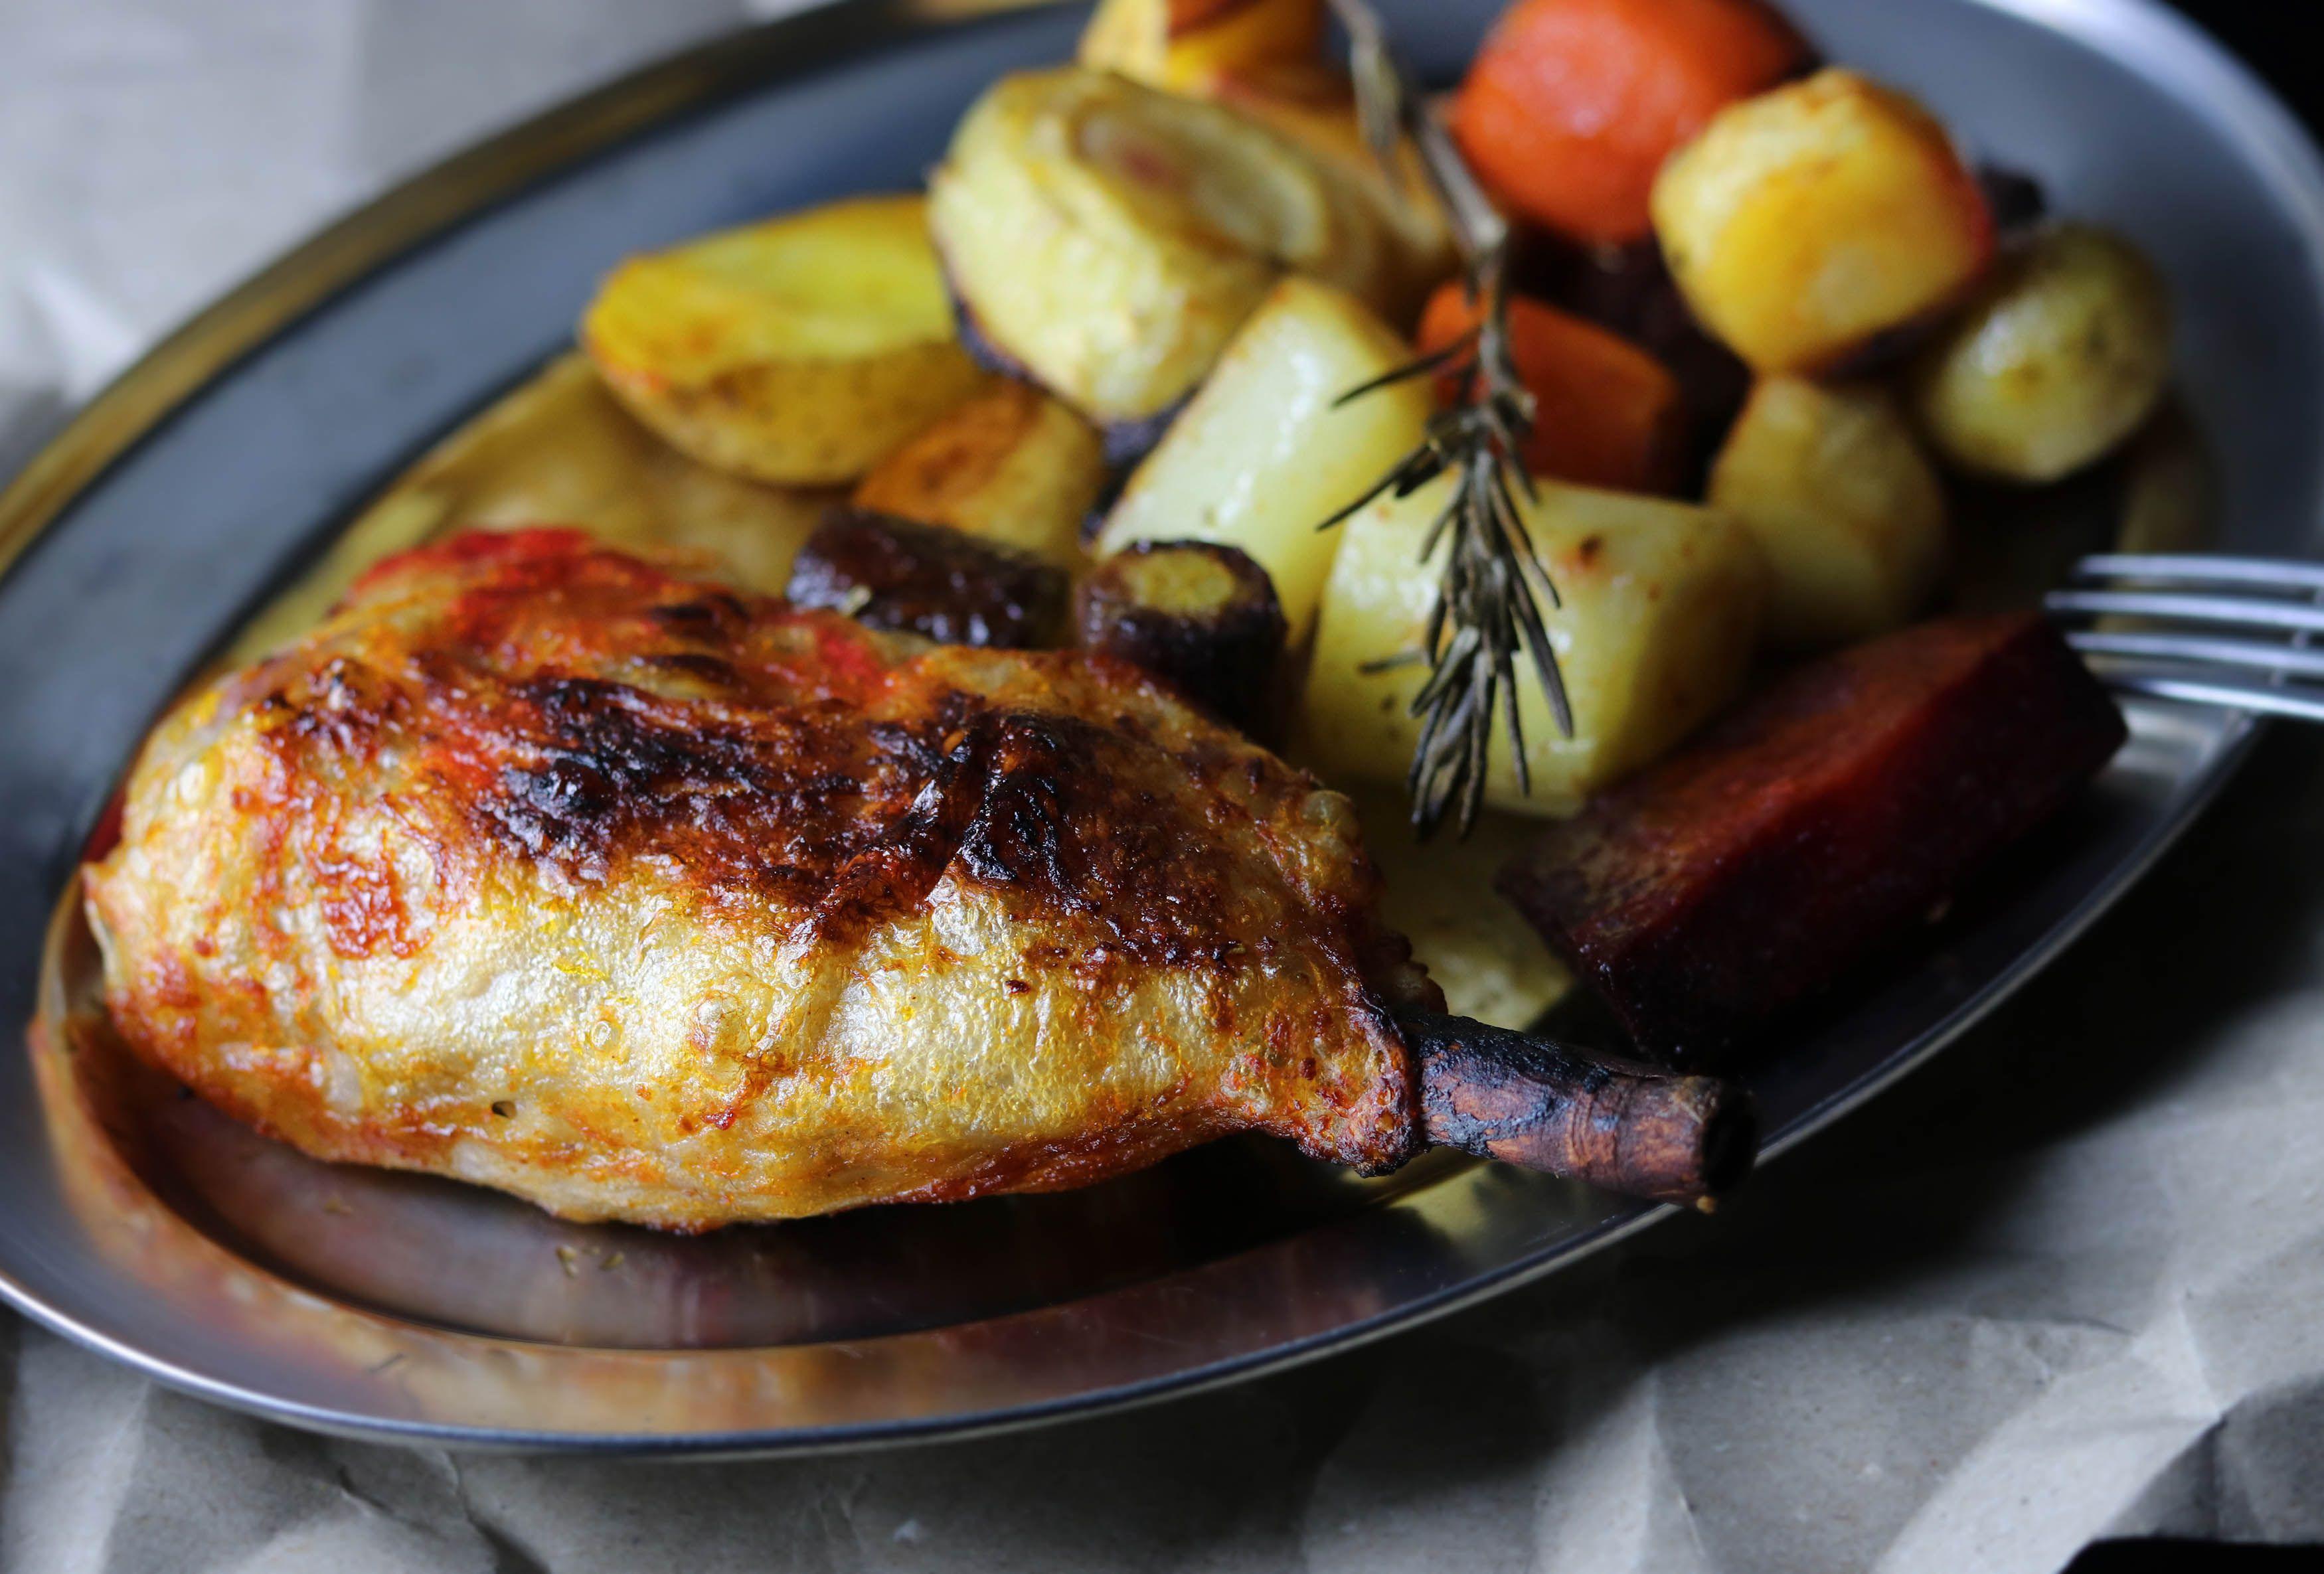 Crispy vegan chicken drumsticks on veggies roasted